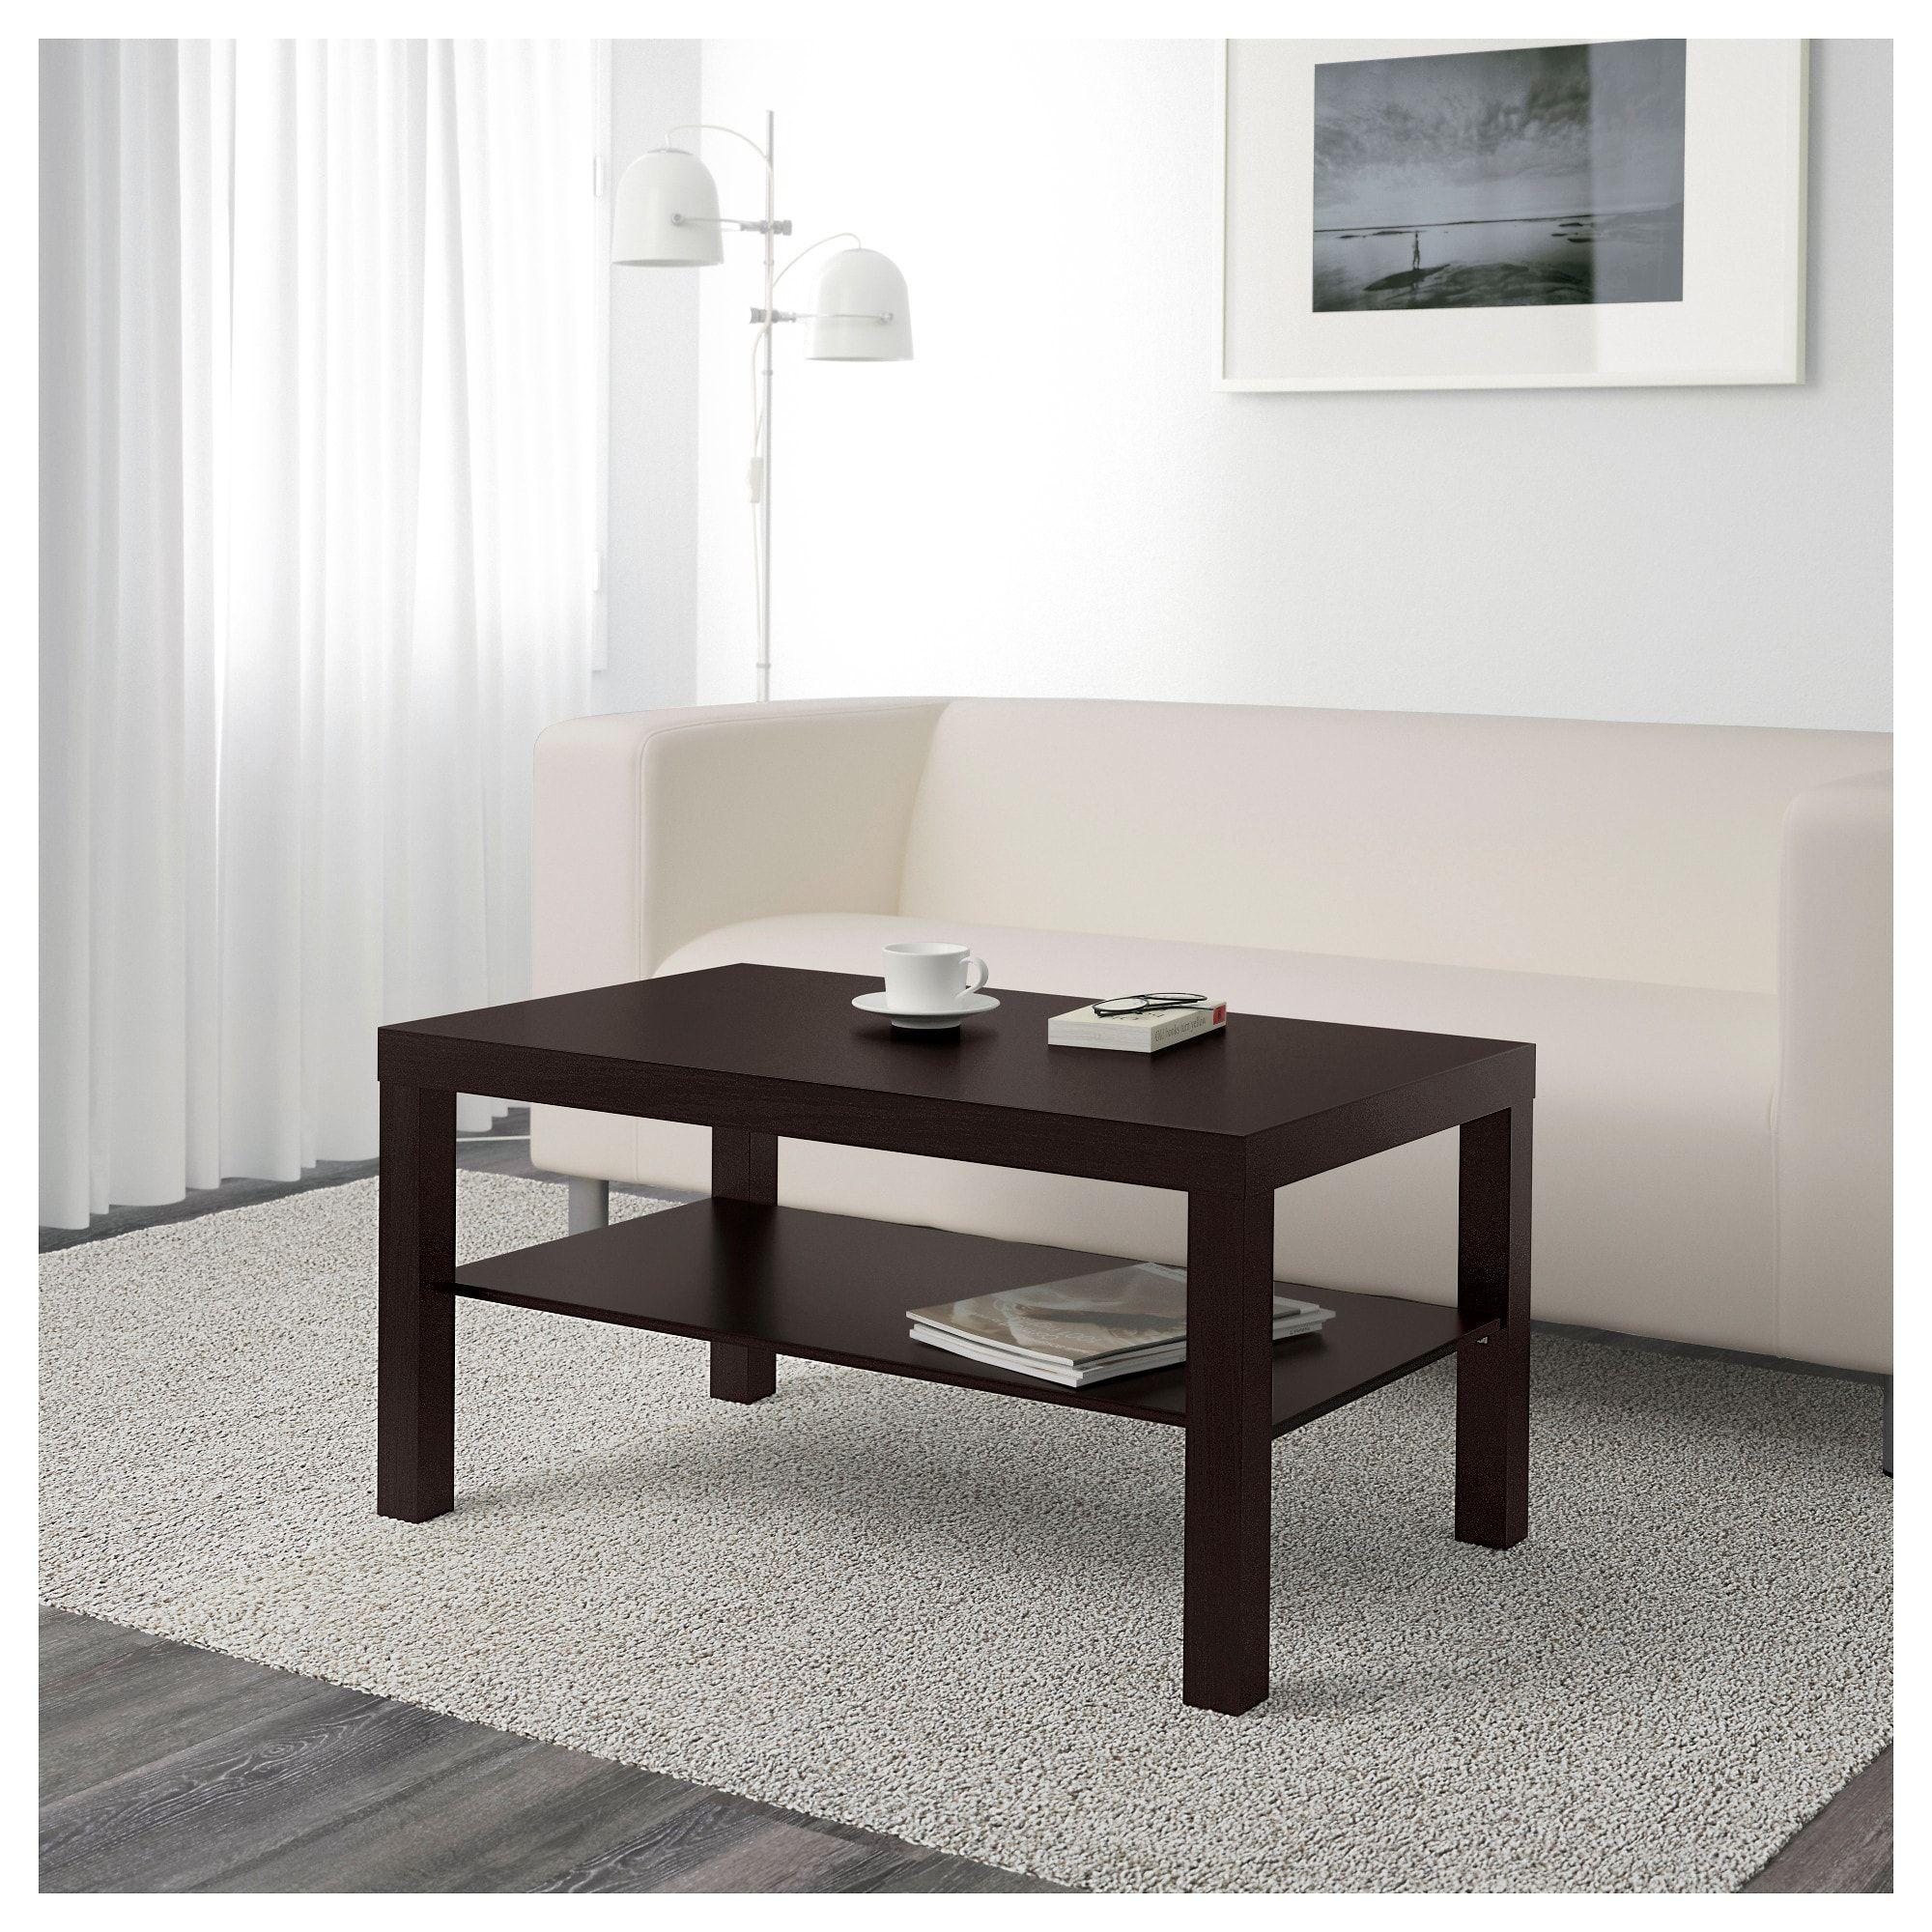 Lack Coffee Table Black Brown 35 3 8x21 5 8 Ikea Ikea Lack Coffee Table Lack Coffee Table Ikea Lack Table [ 2000 x 2000 Pixel ]